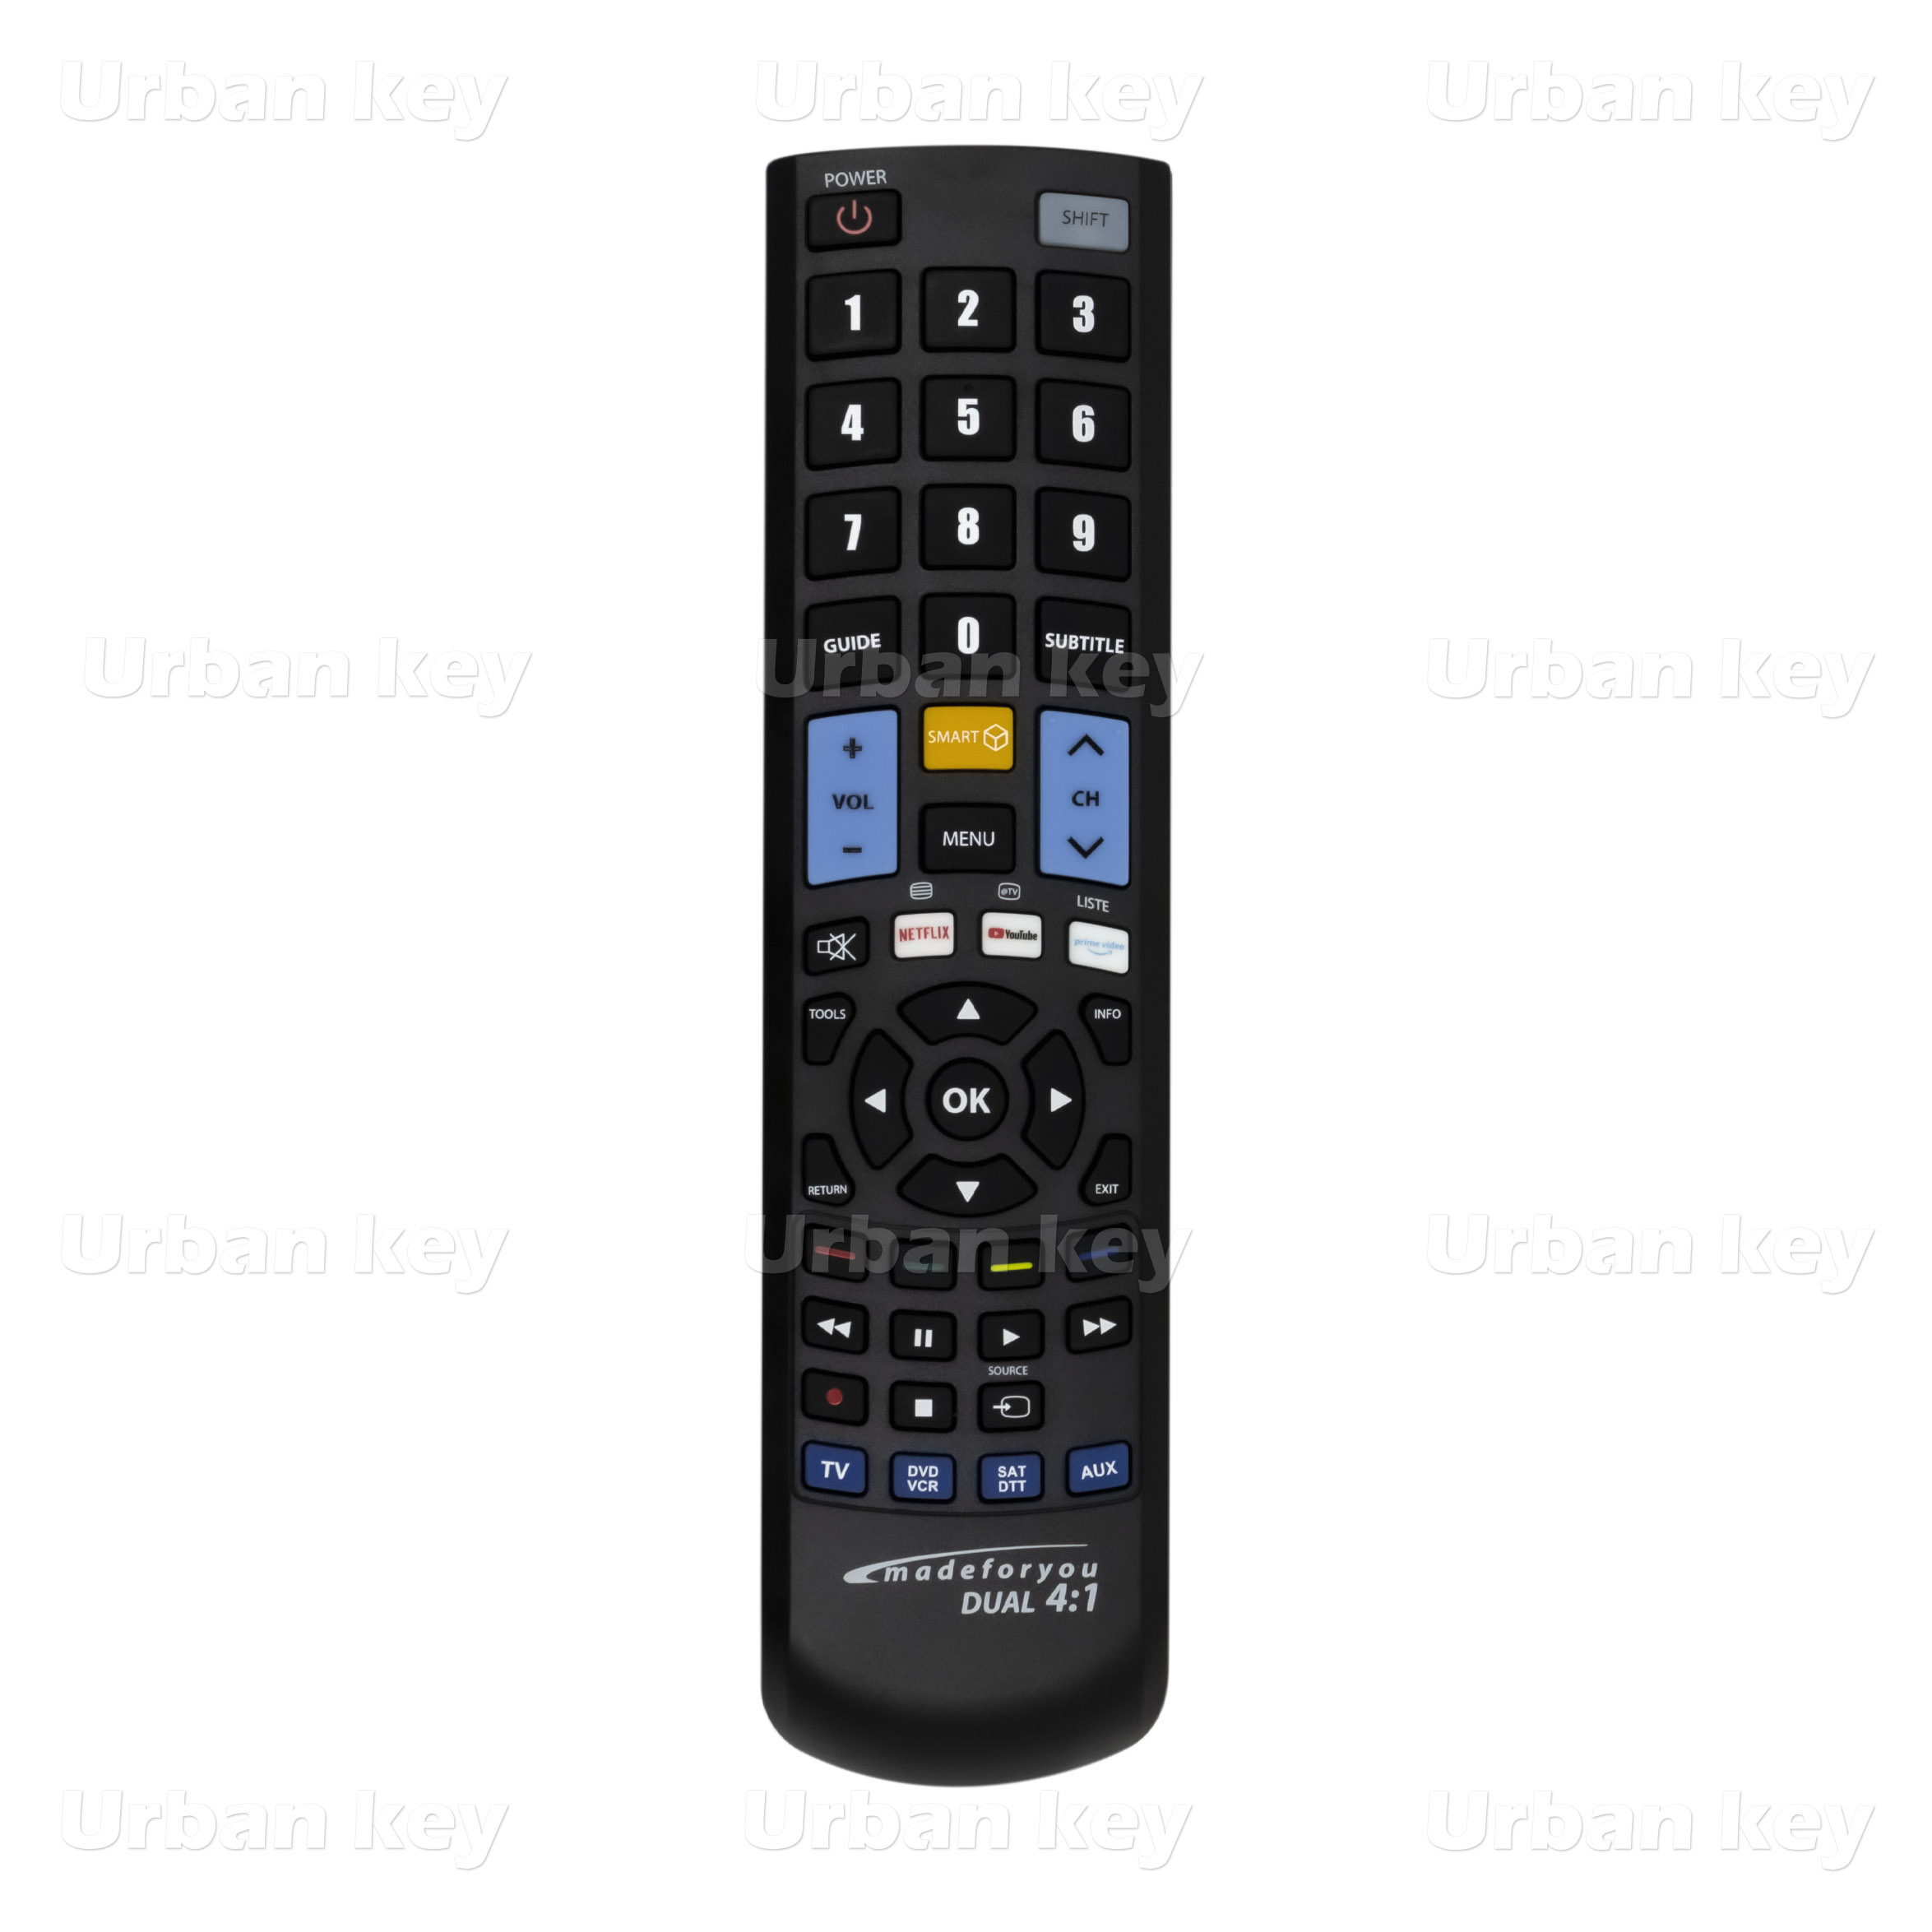 COMANDO UNIVERSAL TV_SATELITE_DTT_DVD 4:1